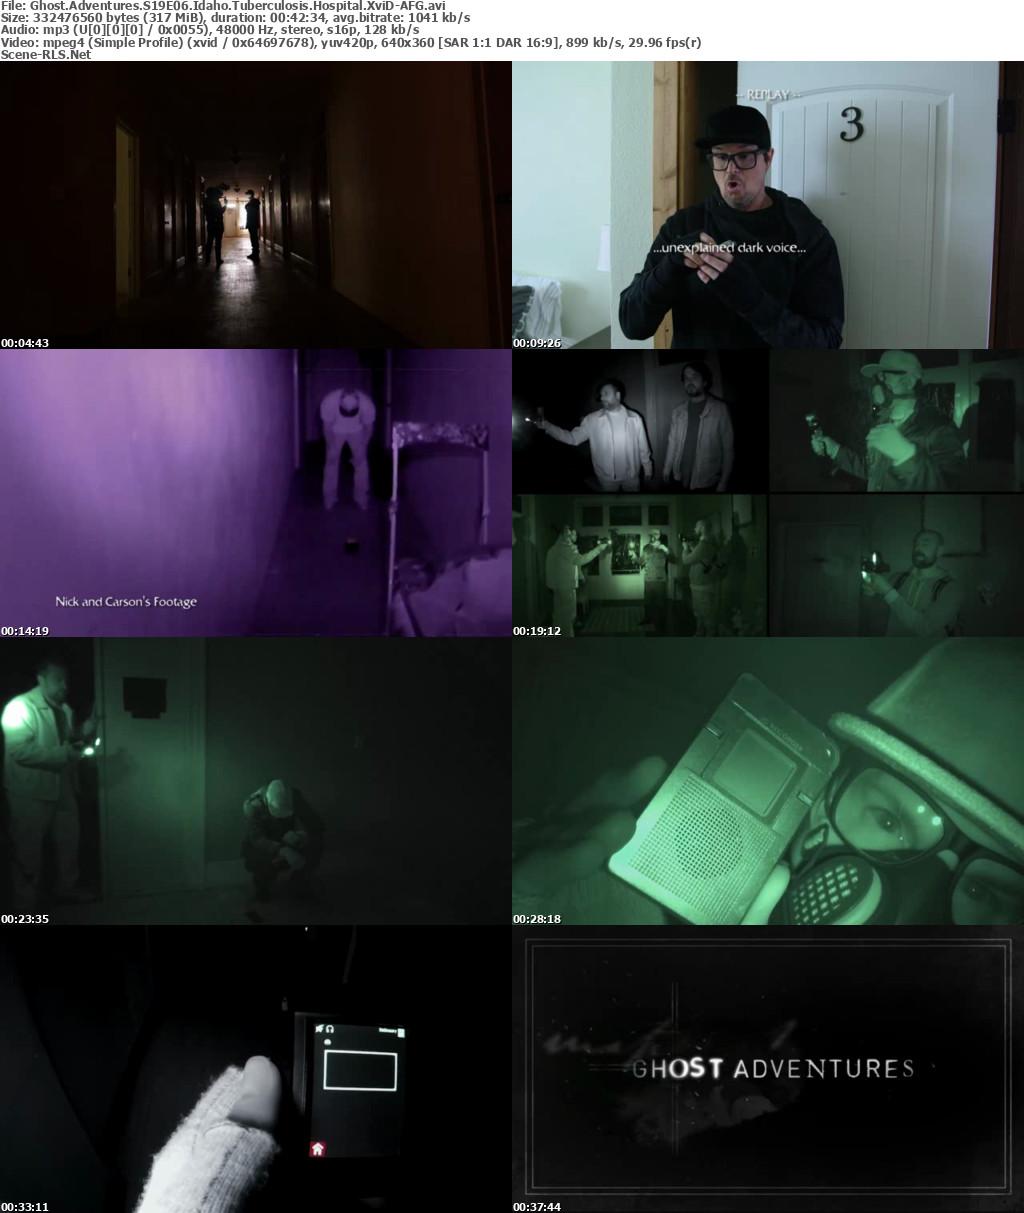 Ghost Adventures S19E06 Idaho Tuberculosis Hospital 720p WEB